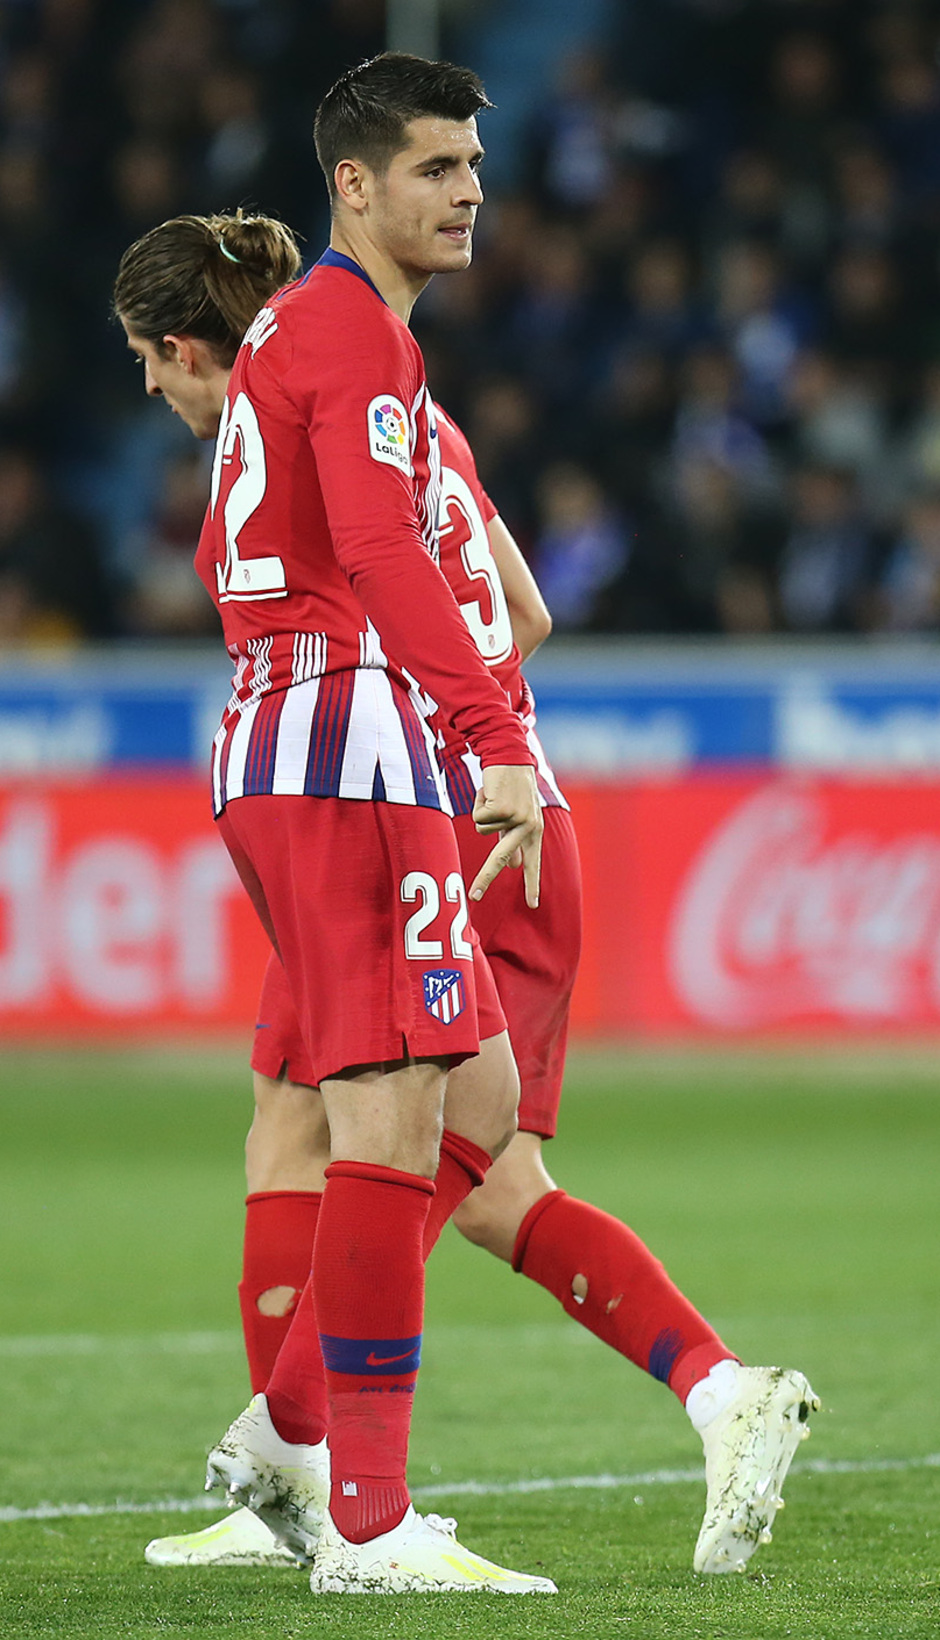 Temporada 18/19 | Alavés - Atlético de Madrid | Morata